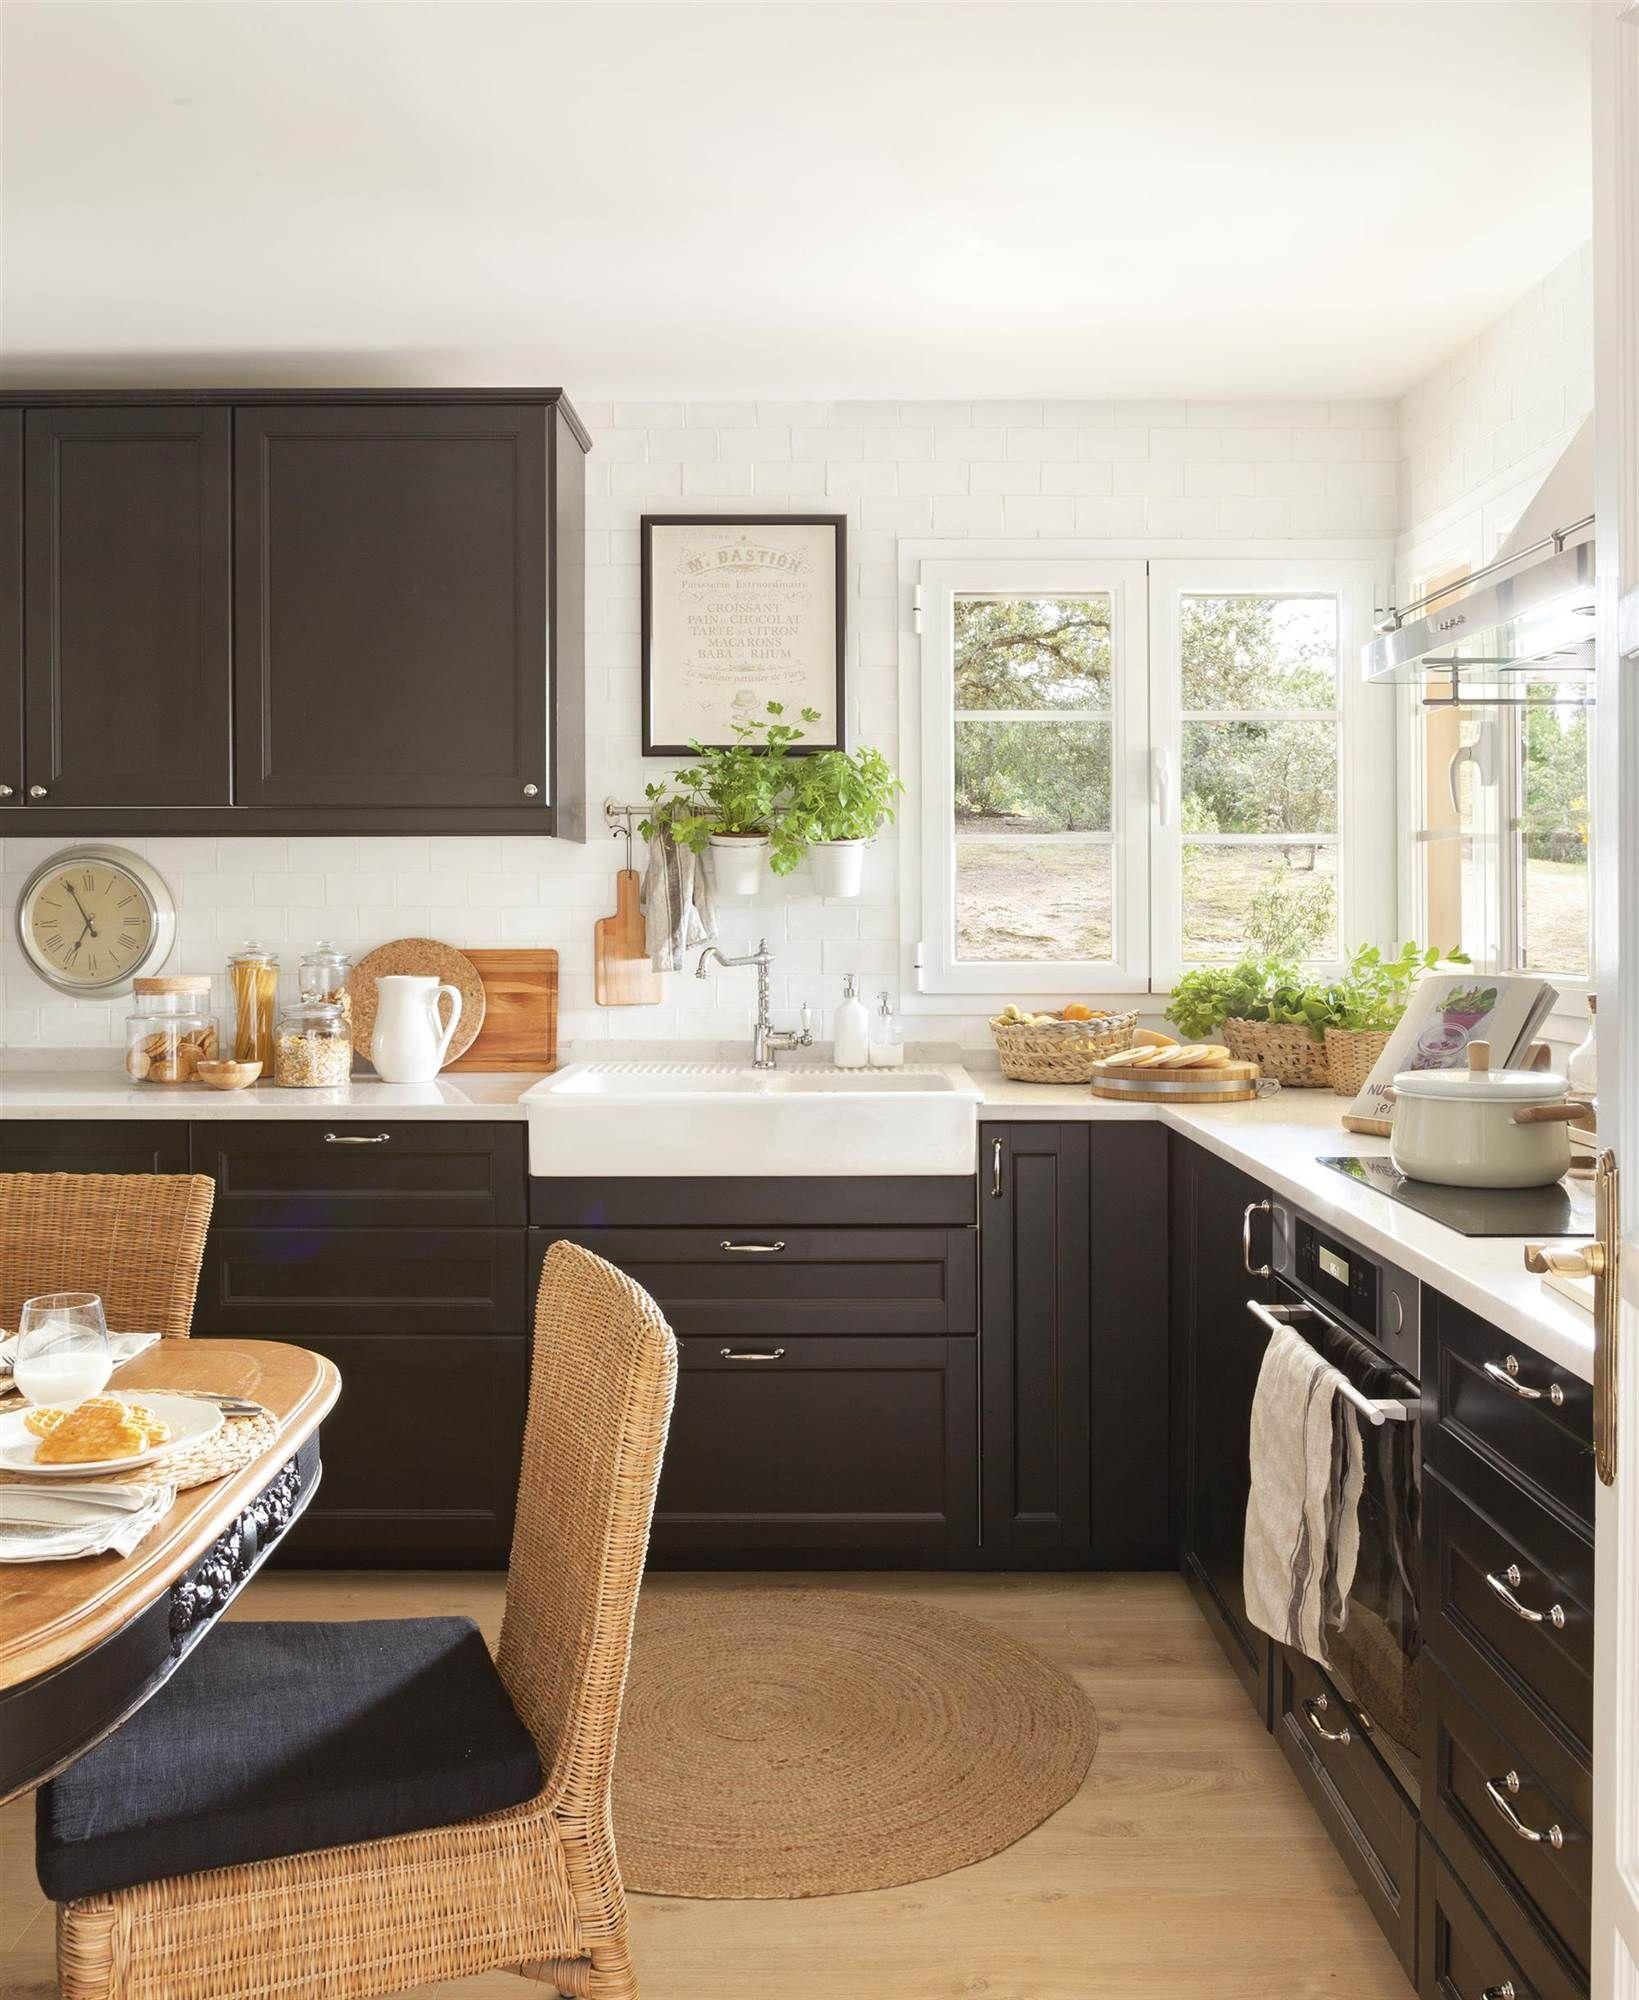 Cocina Con Office Con Muebles De Color Negro Sillas De Fibras Delectable Small Office Kitchen Design Ideas 2018